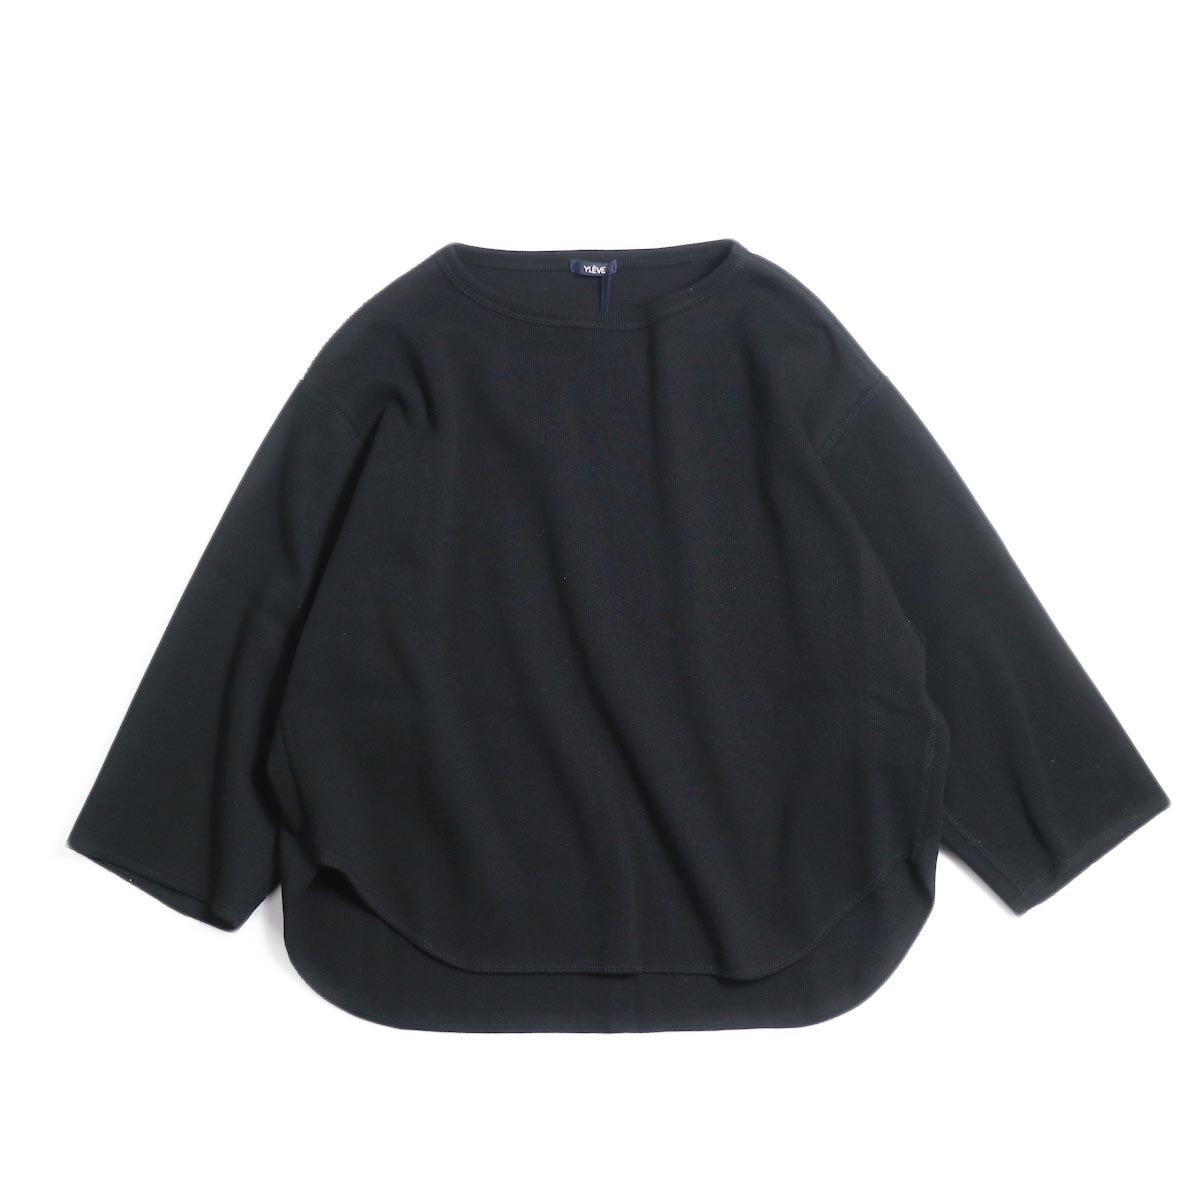 YLEVE / CTN Rib P/O -Black